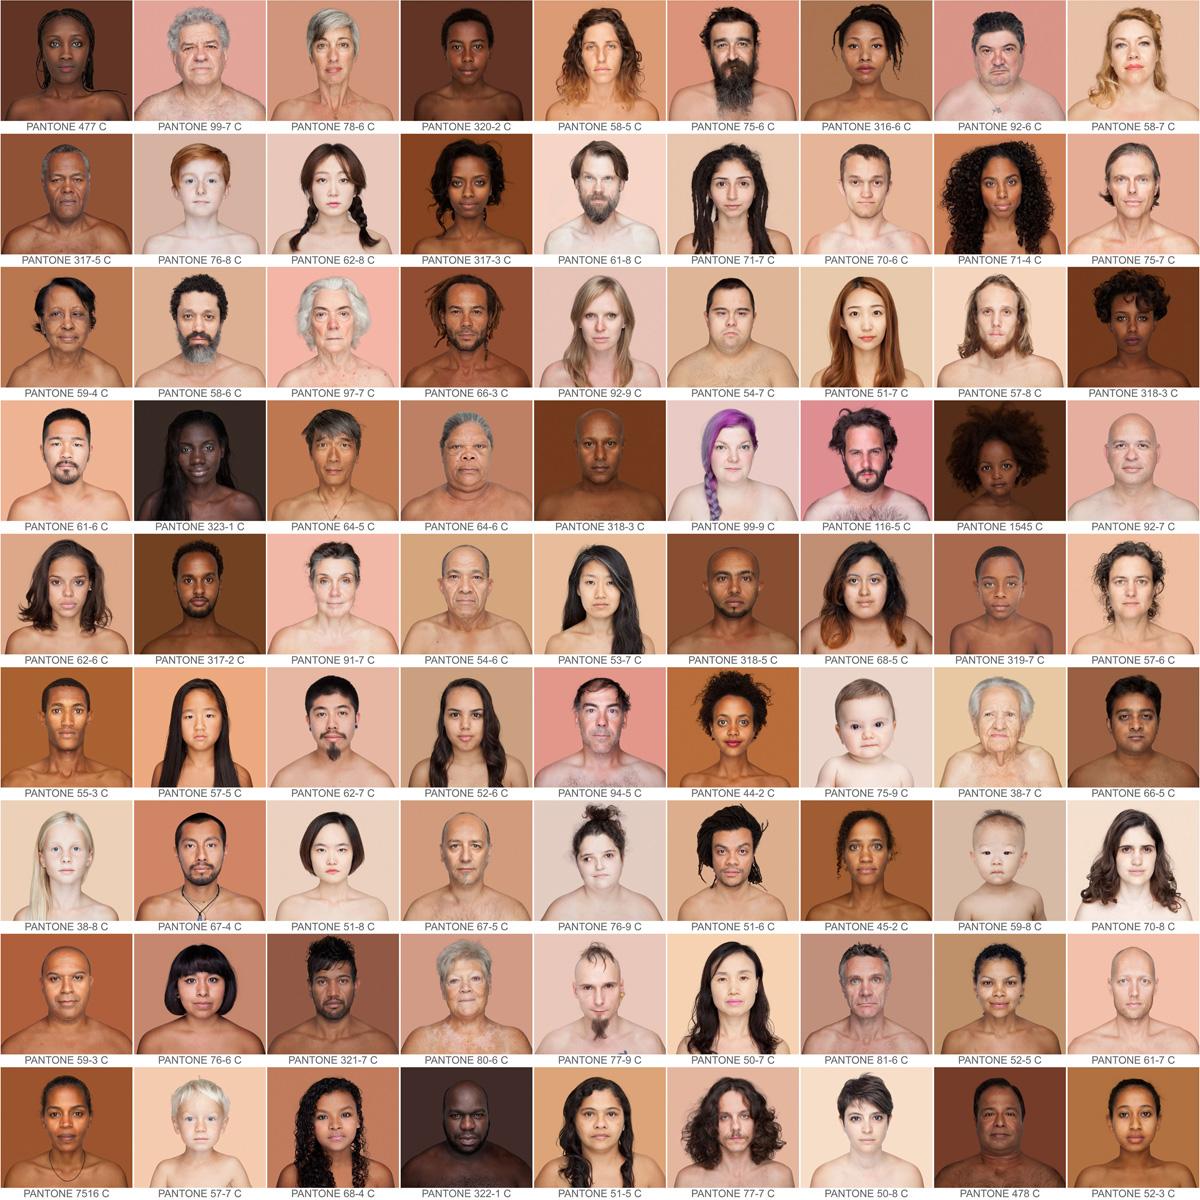 foto: Humanae / Angélica Dass, een mozaïek van portretten in sepia